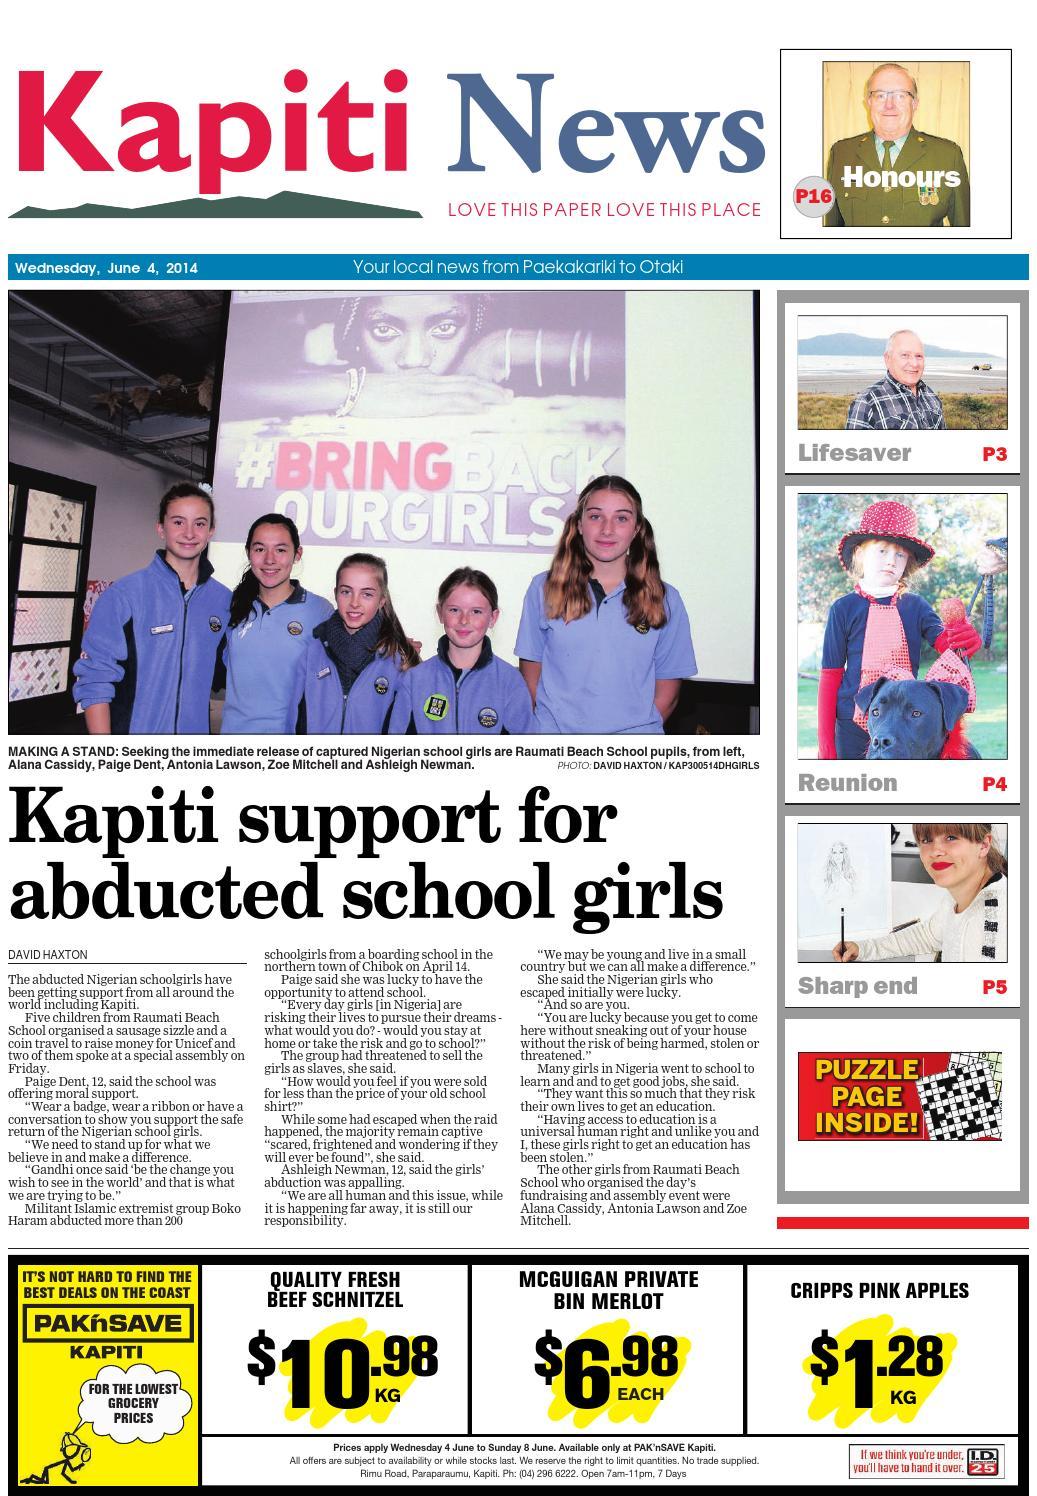 Kapiti news 04 06 14 by local newspapers issuu fandeluxe Gallery